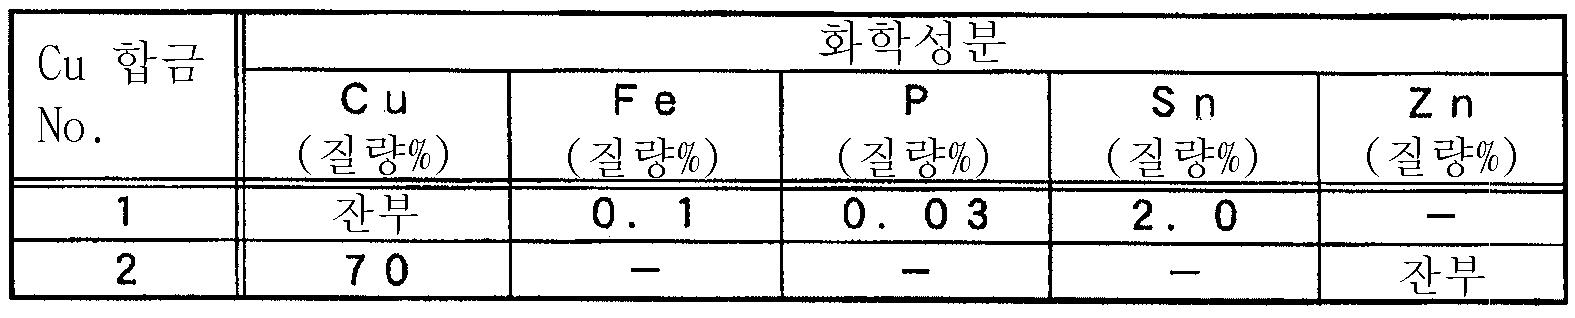 Figure 112007019148251-pct00001